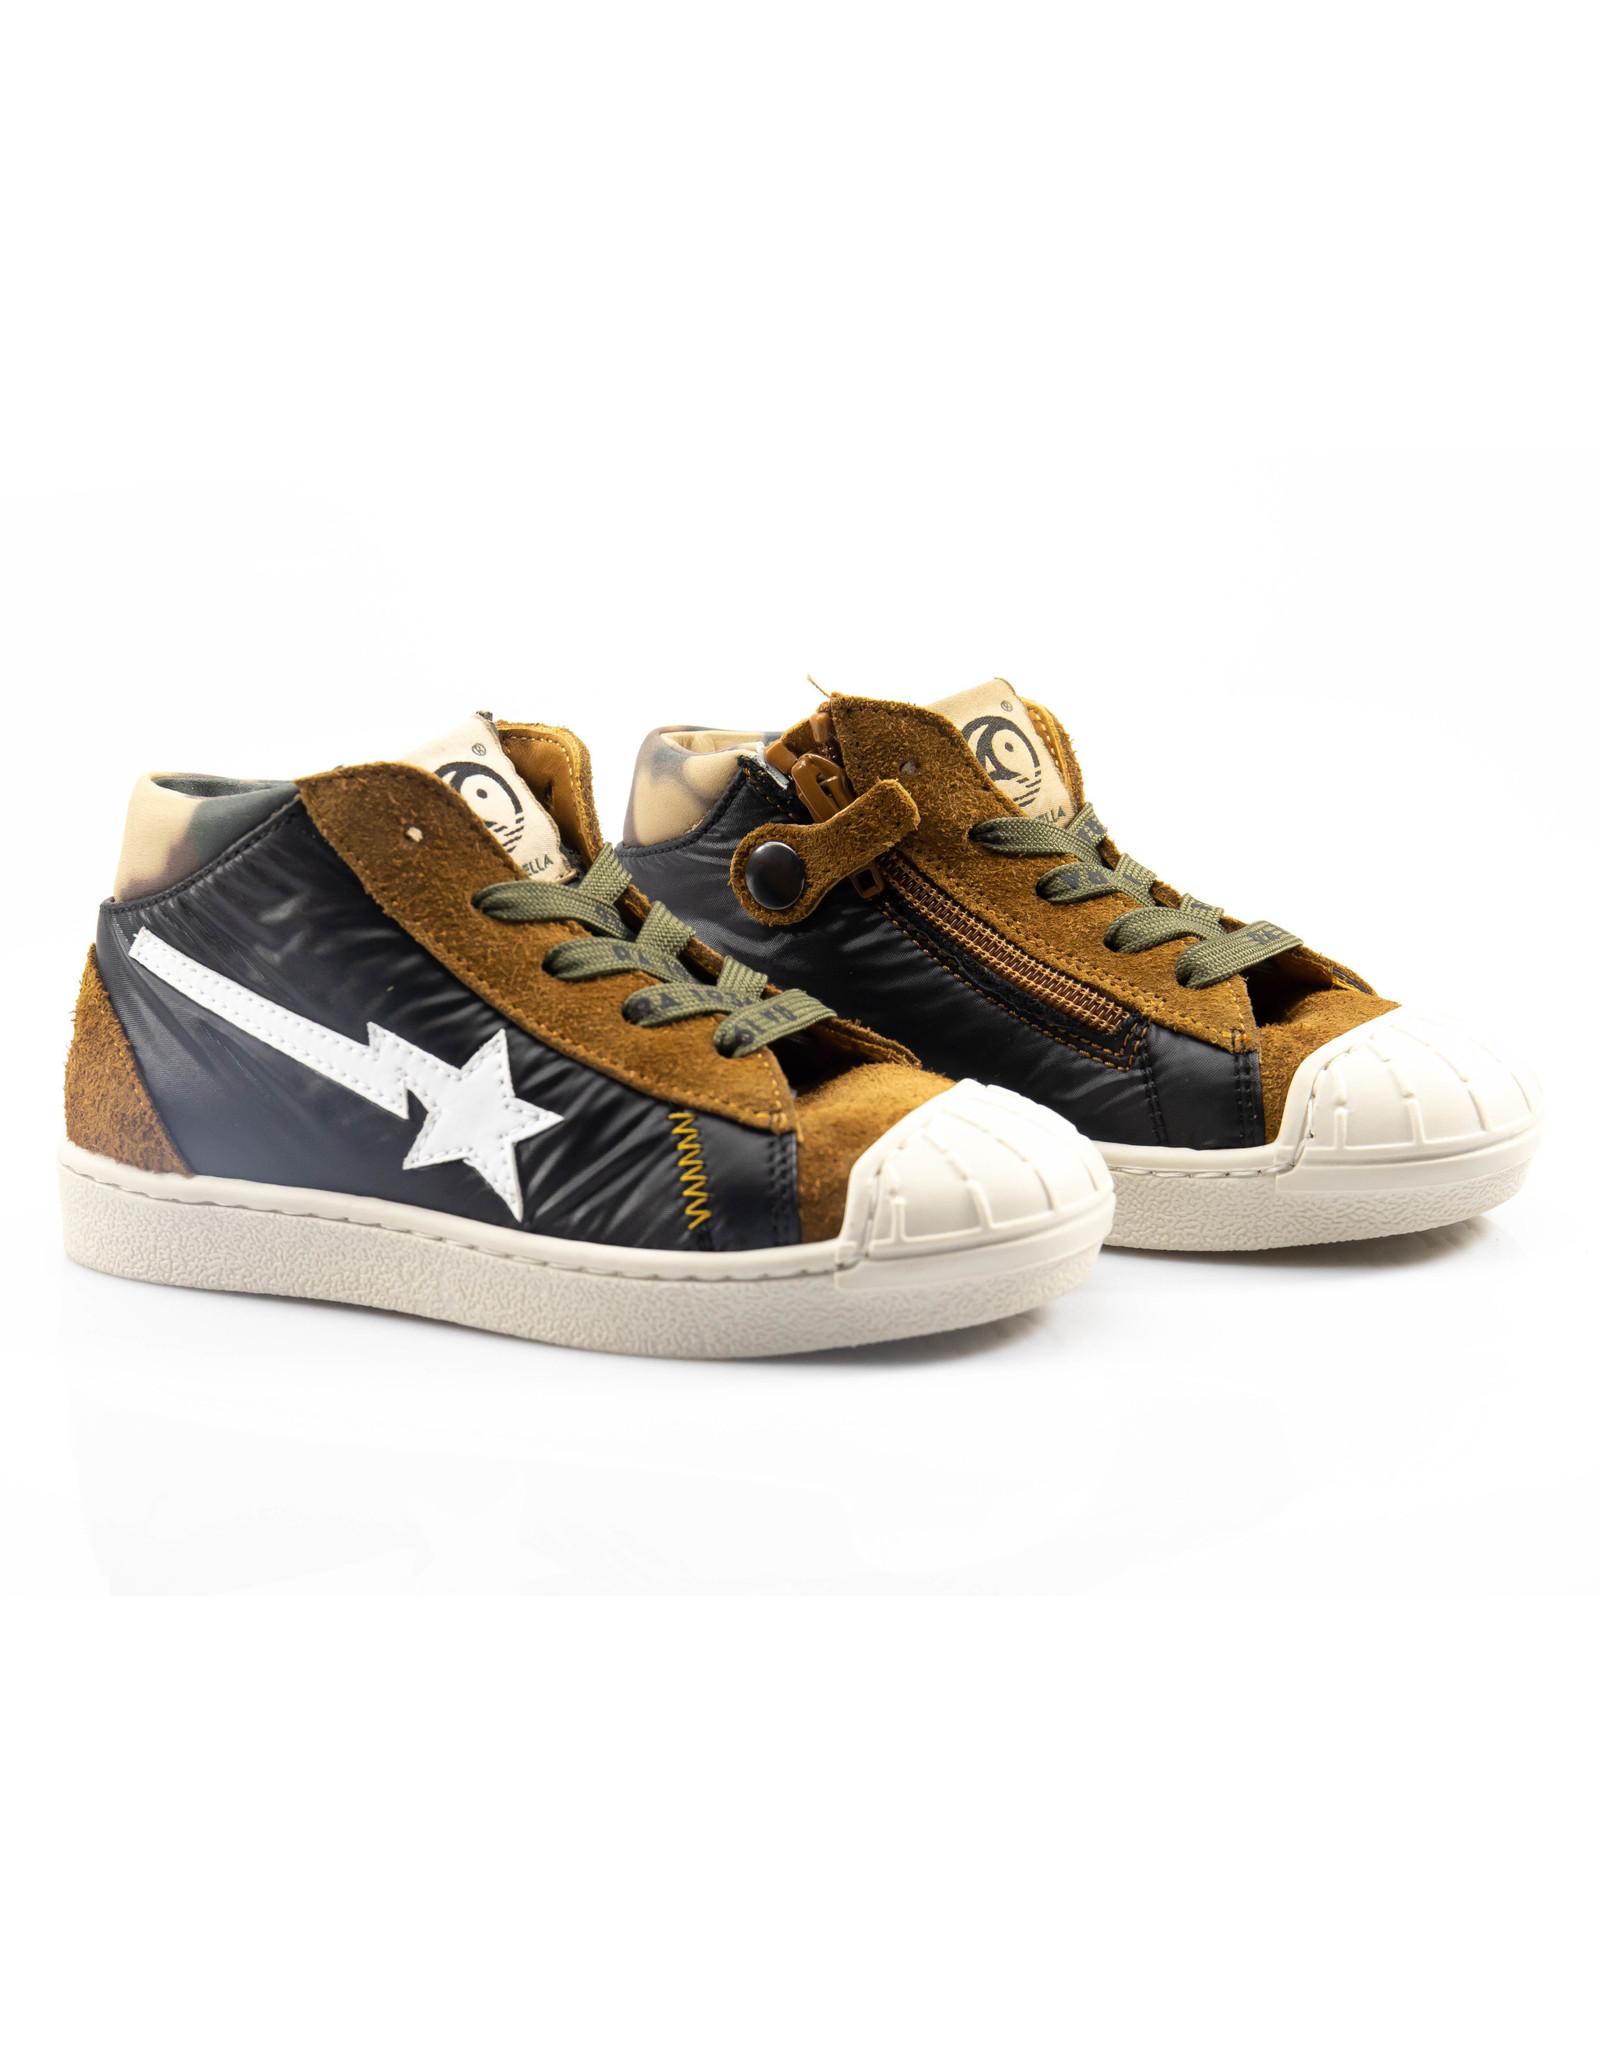 Rondinella hoge sneaker nubuck cognac/zwart/witte ster